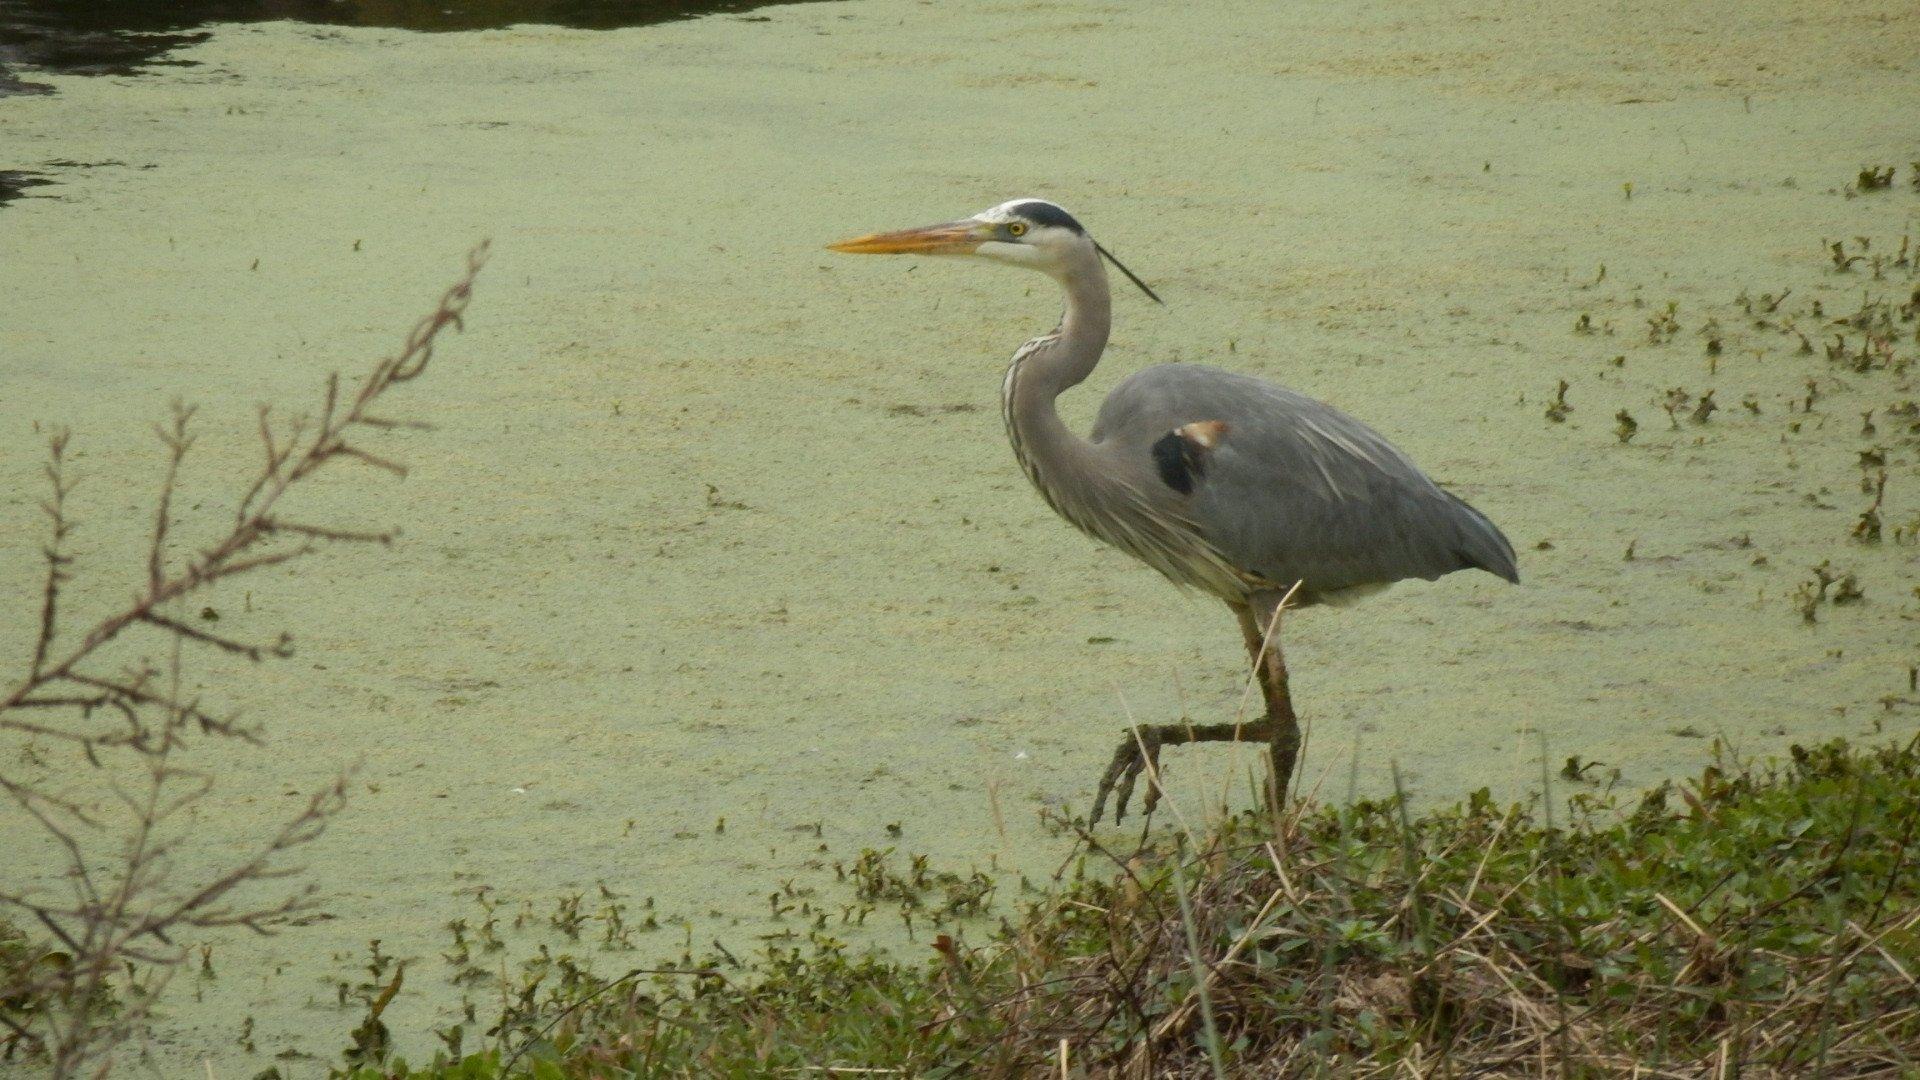 Wading bird at Jarvis Creek Park